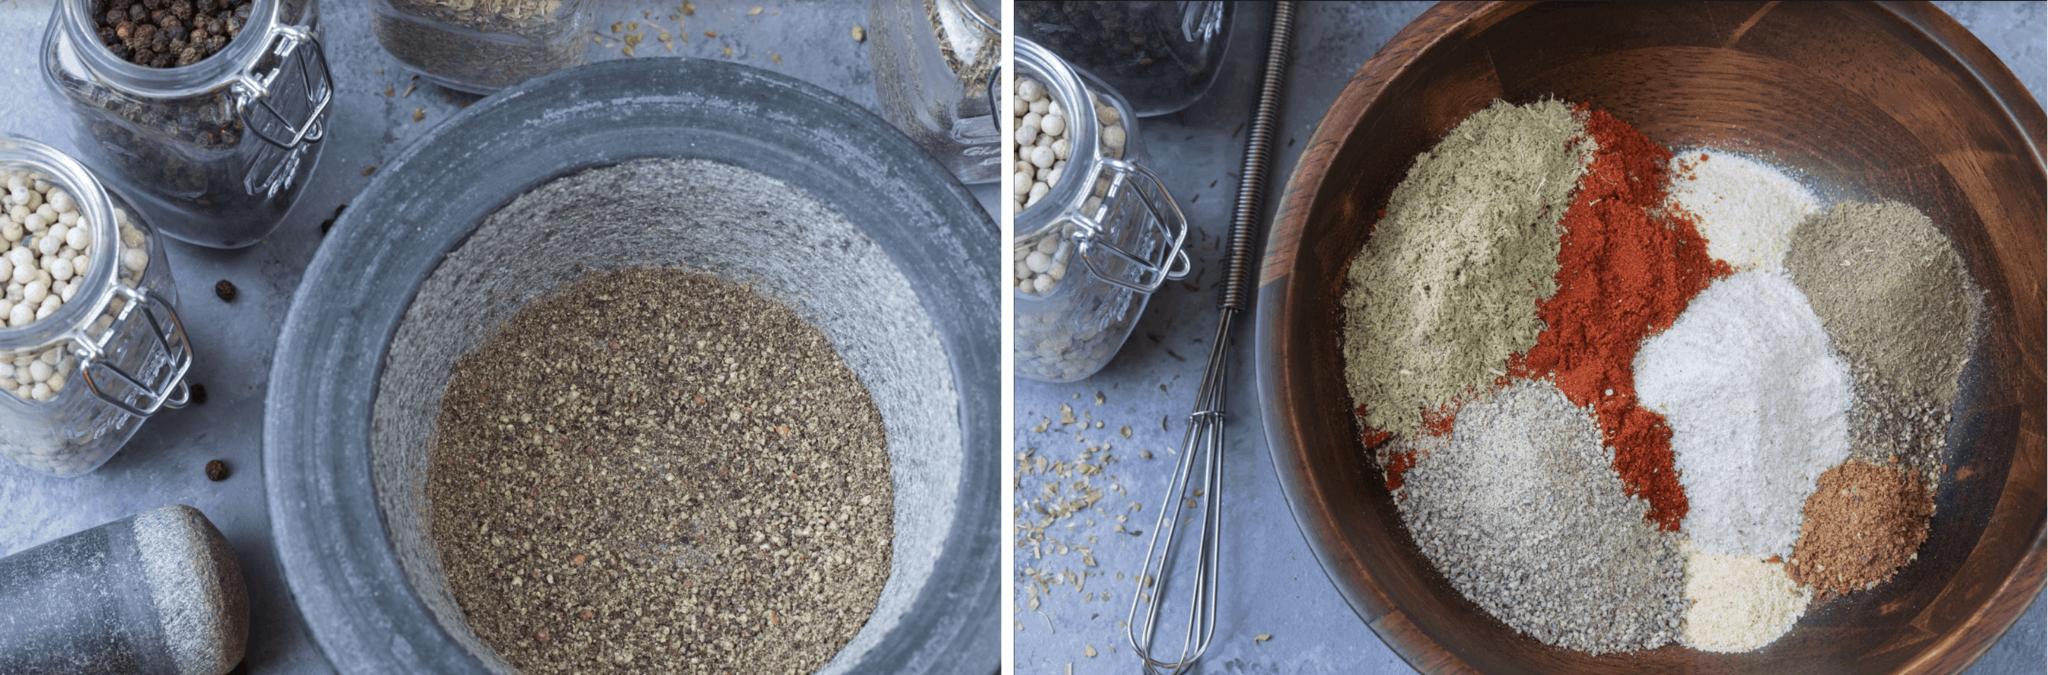 recipe for blackening seasoning prep